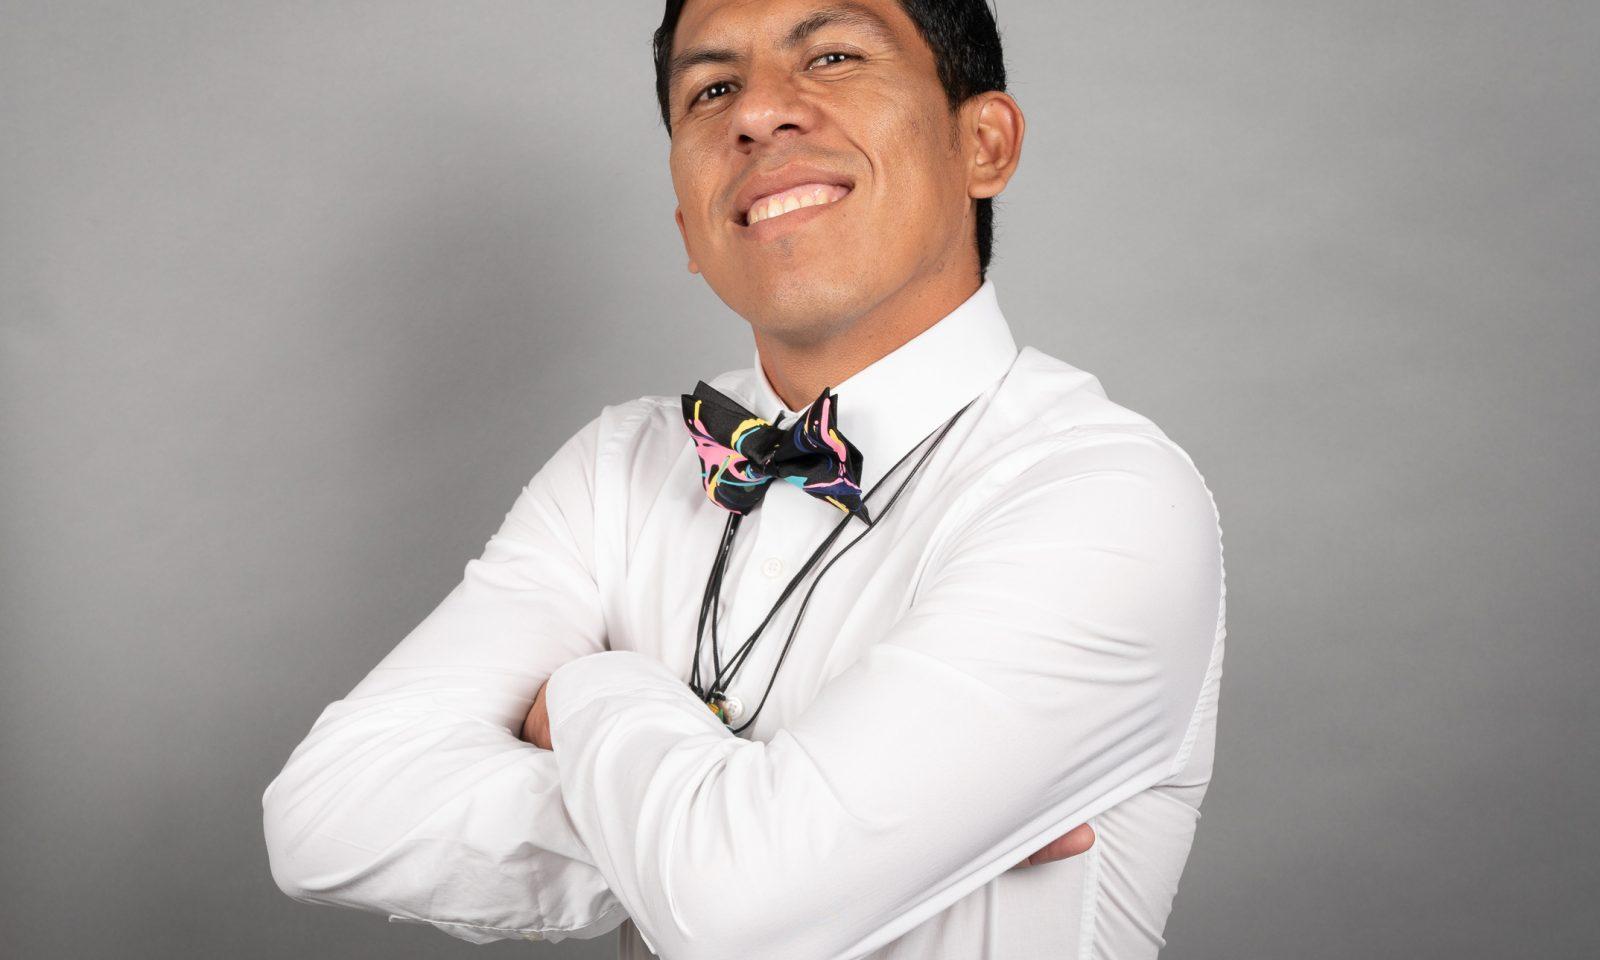 Rene Soto, 2019 NALAC Leadership Insitute Fellow